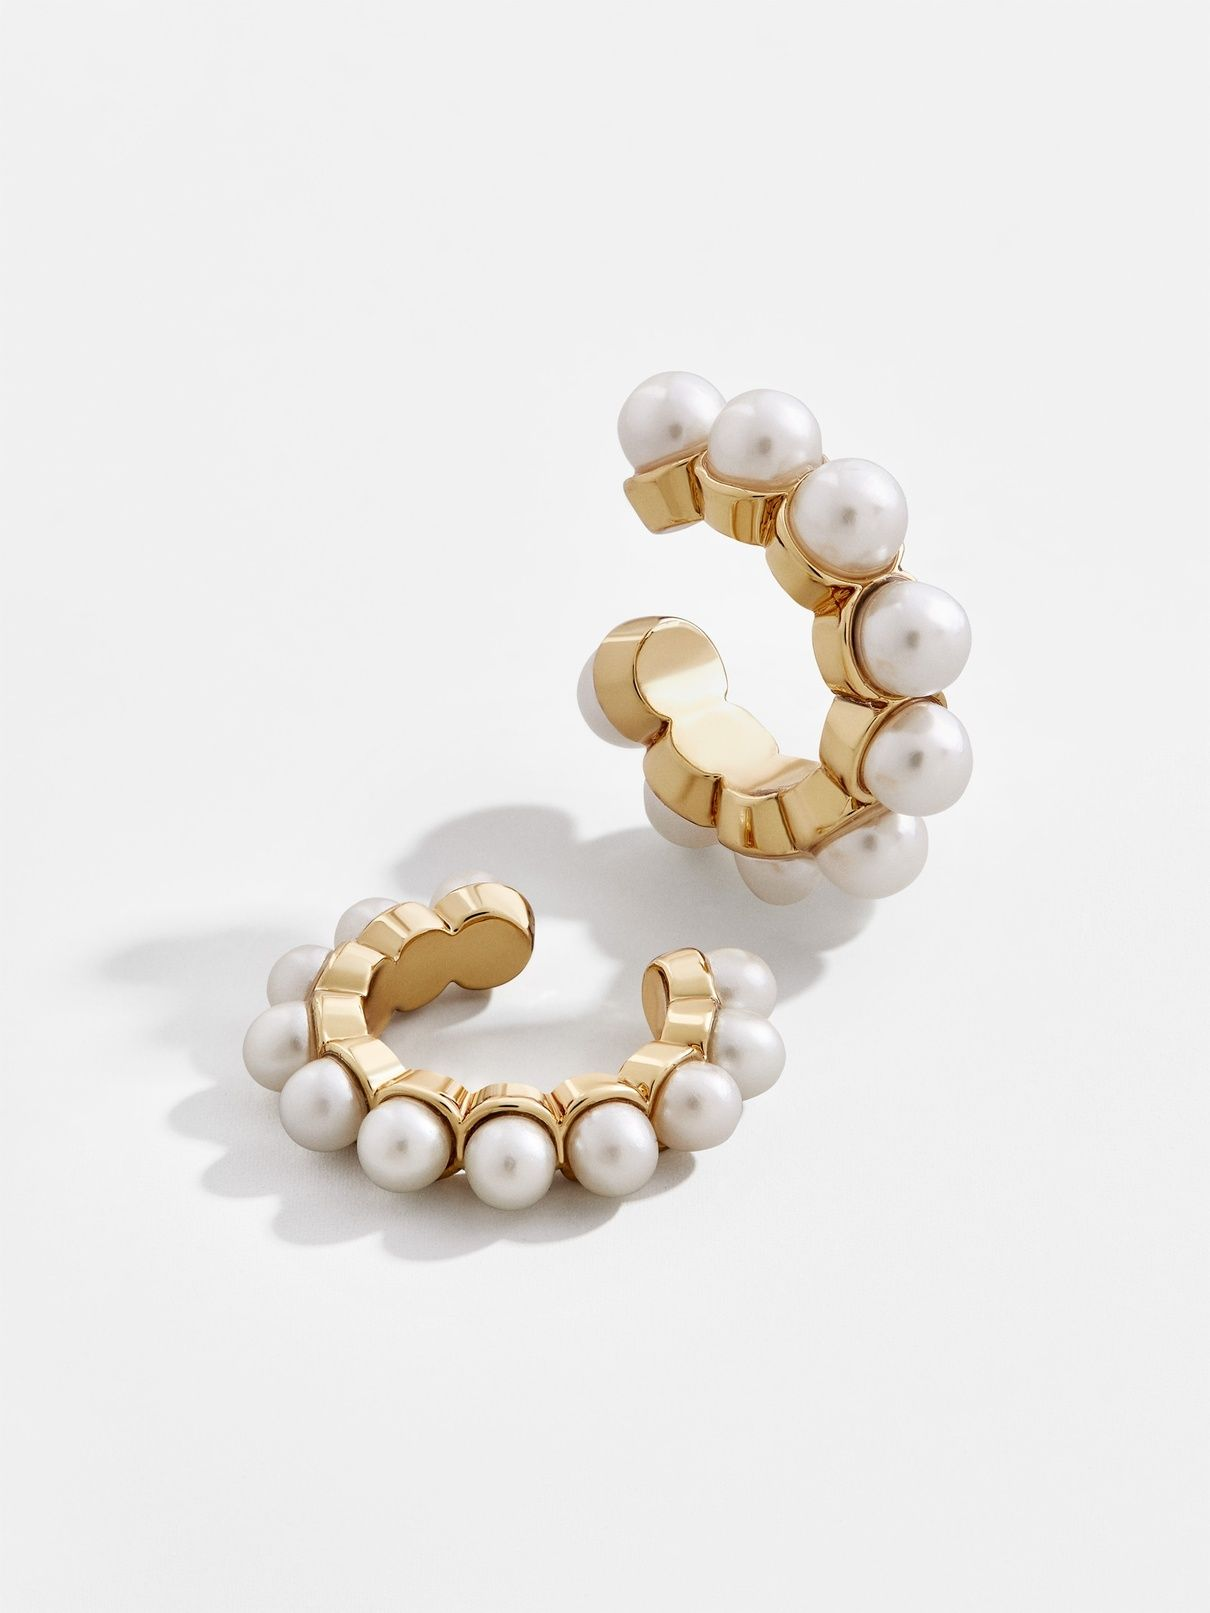 Cheap Bulk Cz Stud Earrings